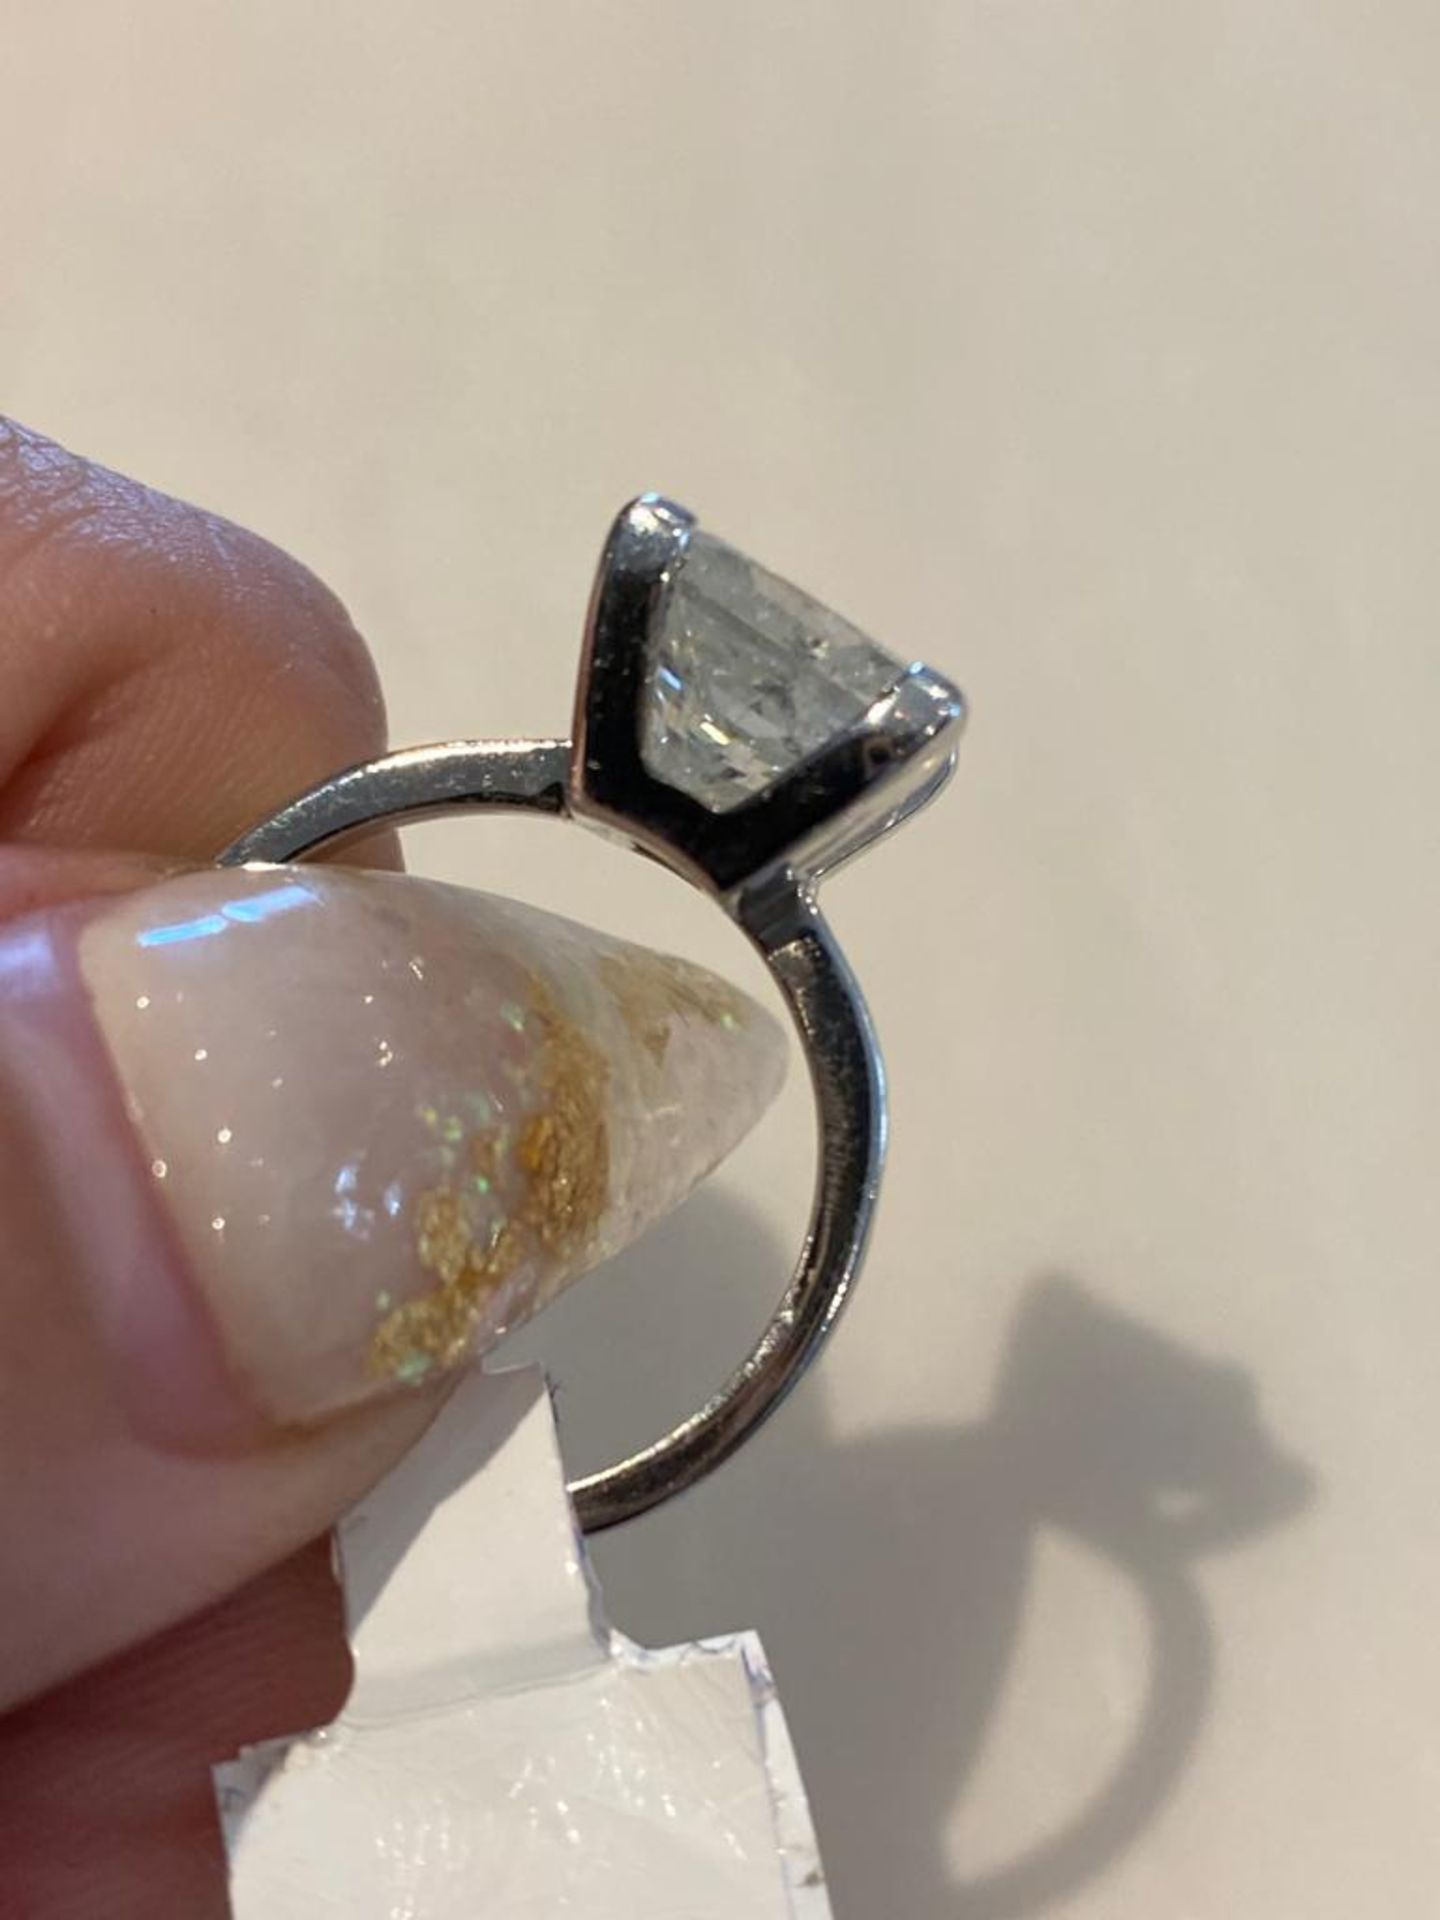 4.03 CT DIAMOND ING PRINCESS CUT - Image 2 of 7